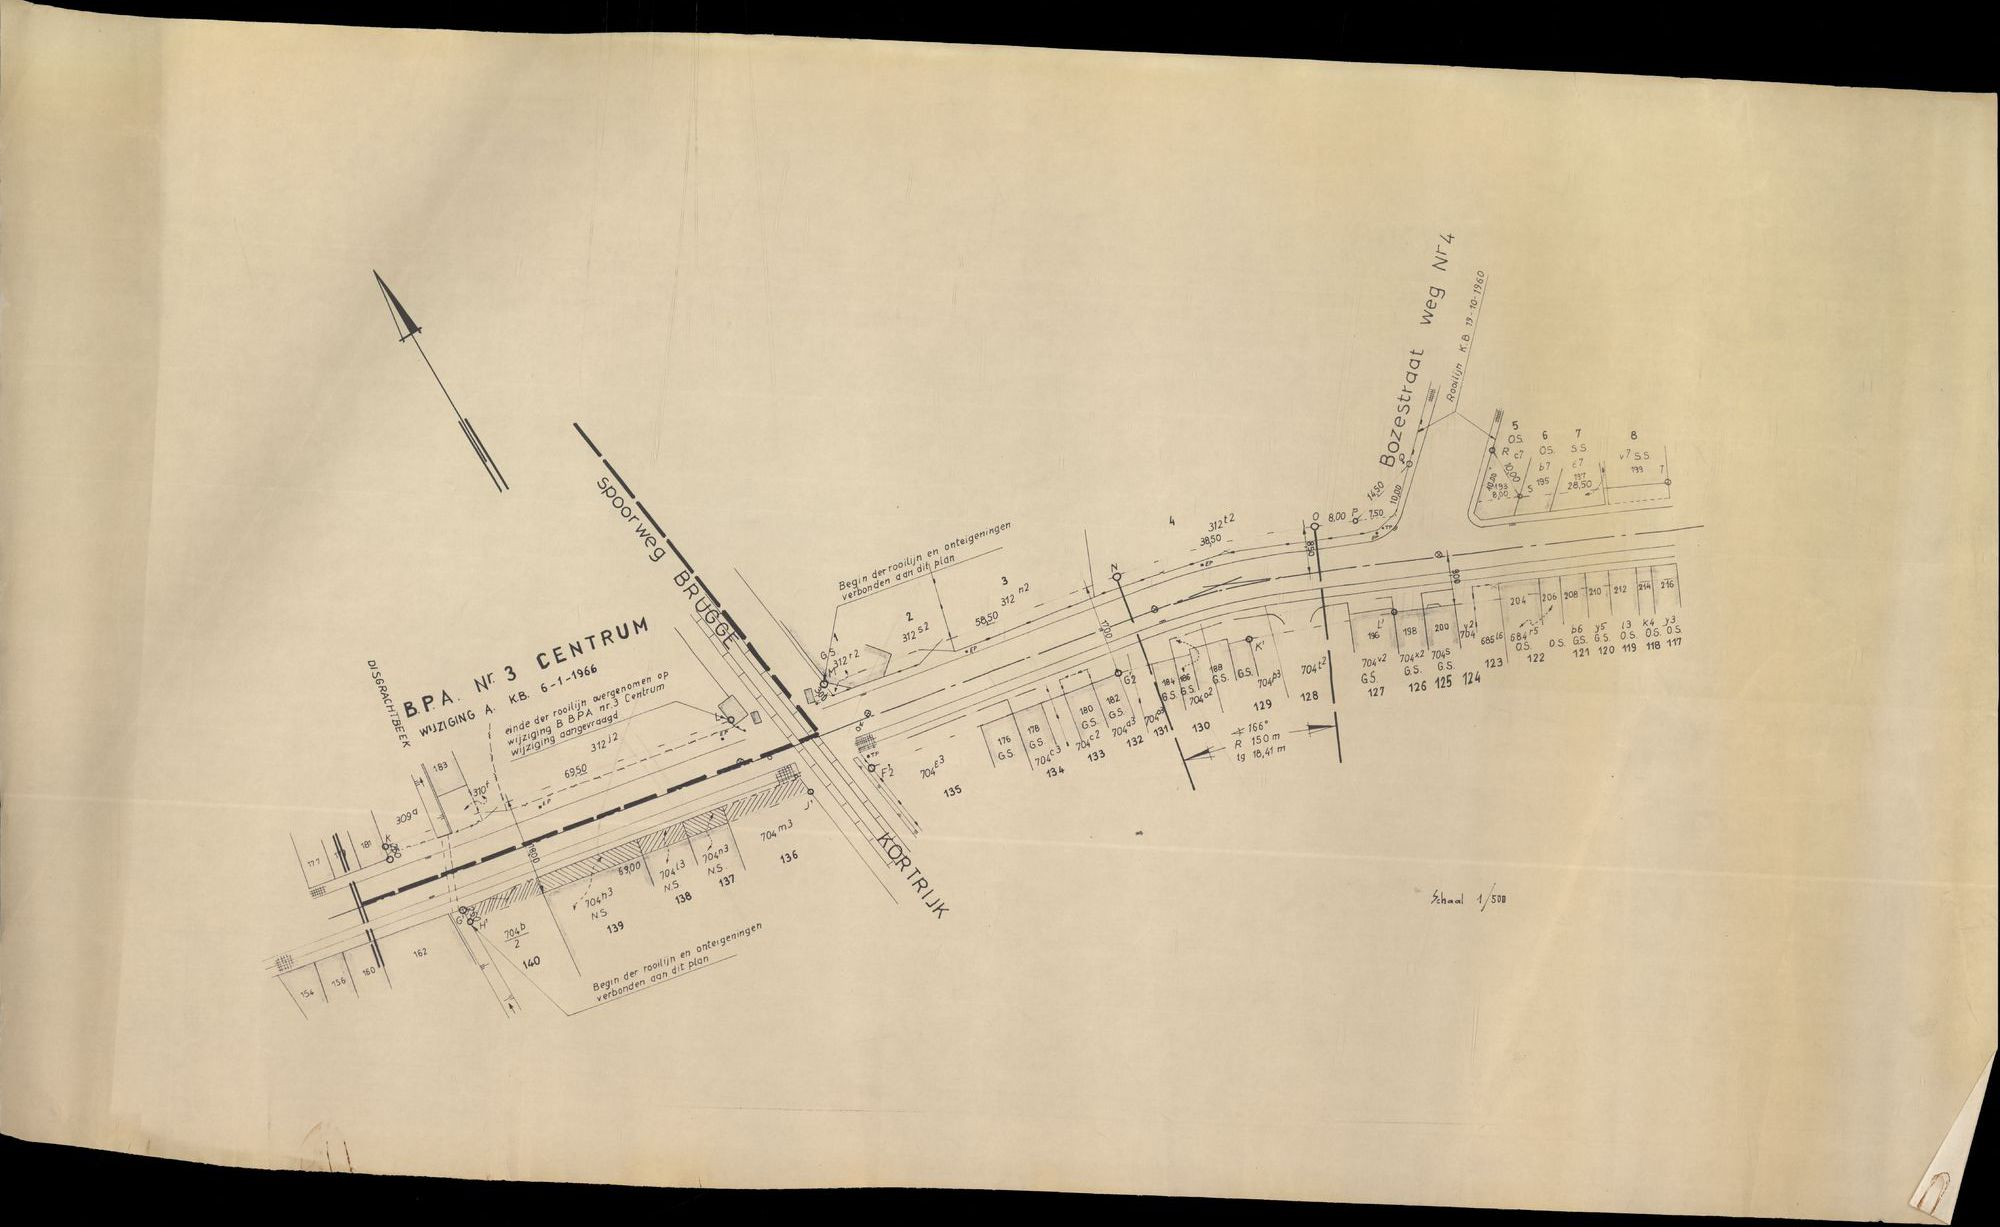 Plan B.P.A. nr. 3, centrum te Heule, 1966